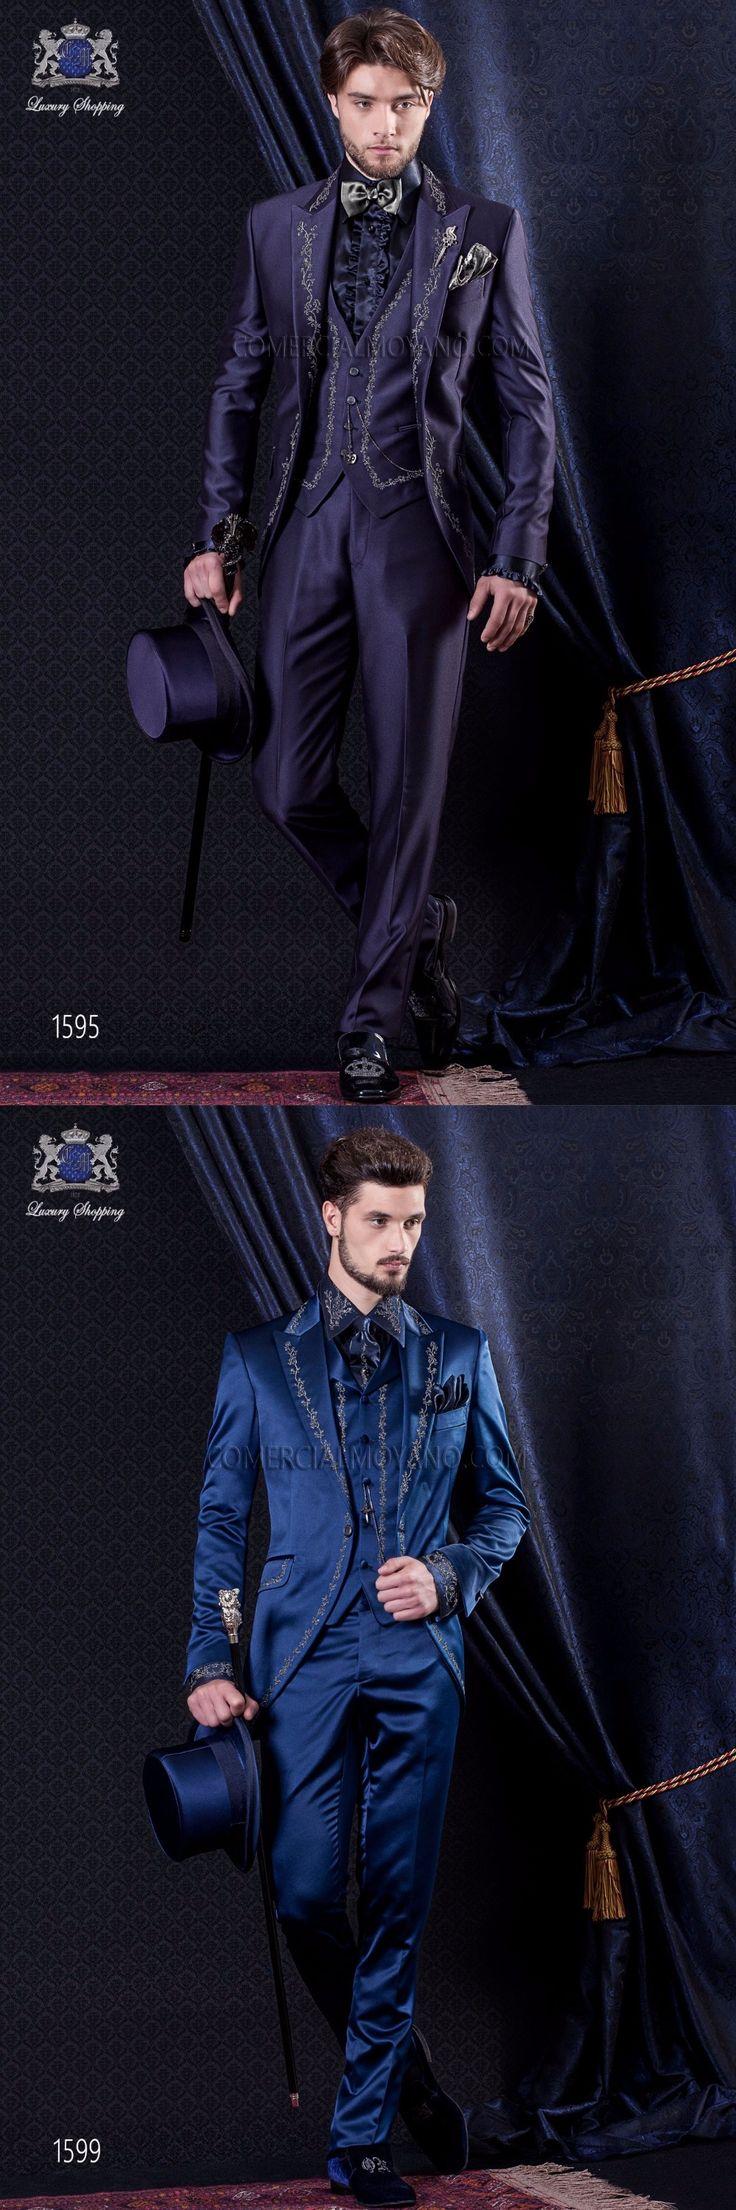 2017 Latest Coat Pant Designs ItalianPurple Blue Satin Embroidery Men Suit Slim Fit 3 Piece Tuxedo Custom Prom Blazer Masculino